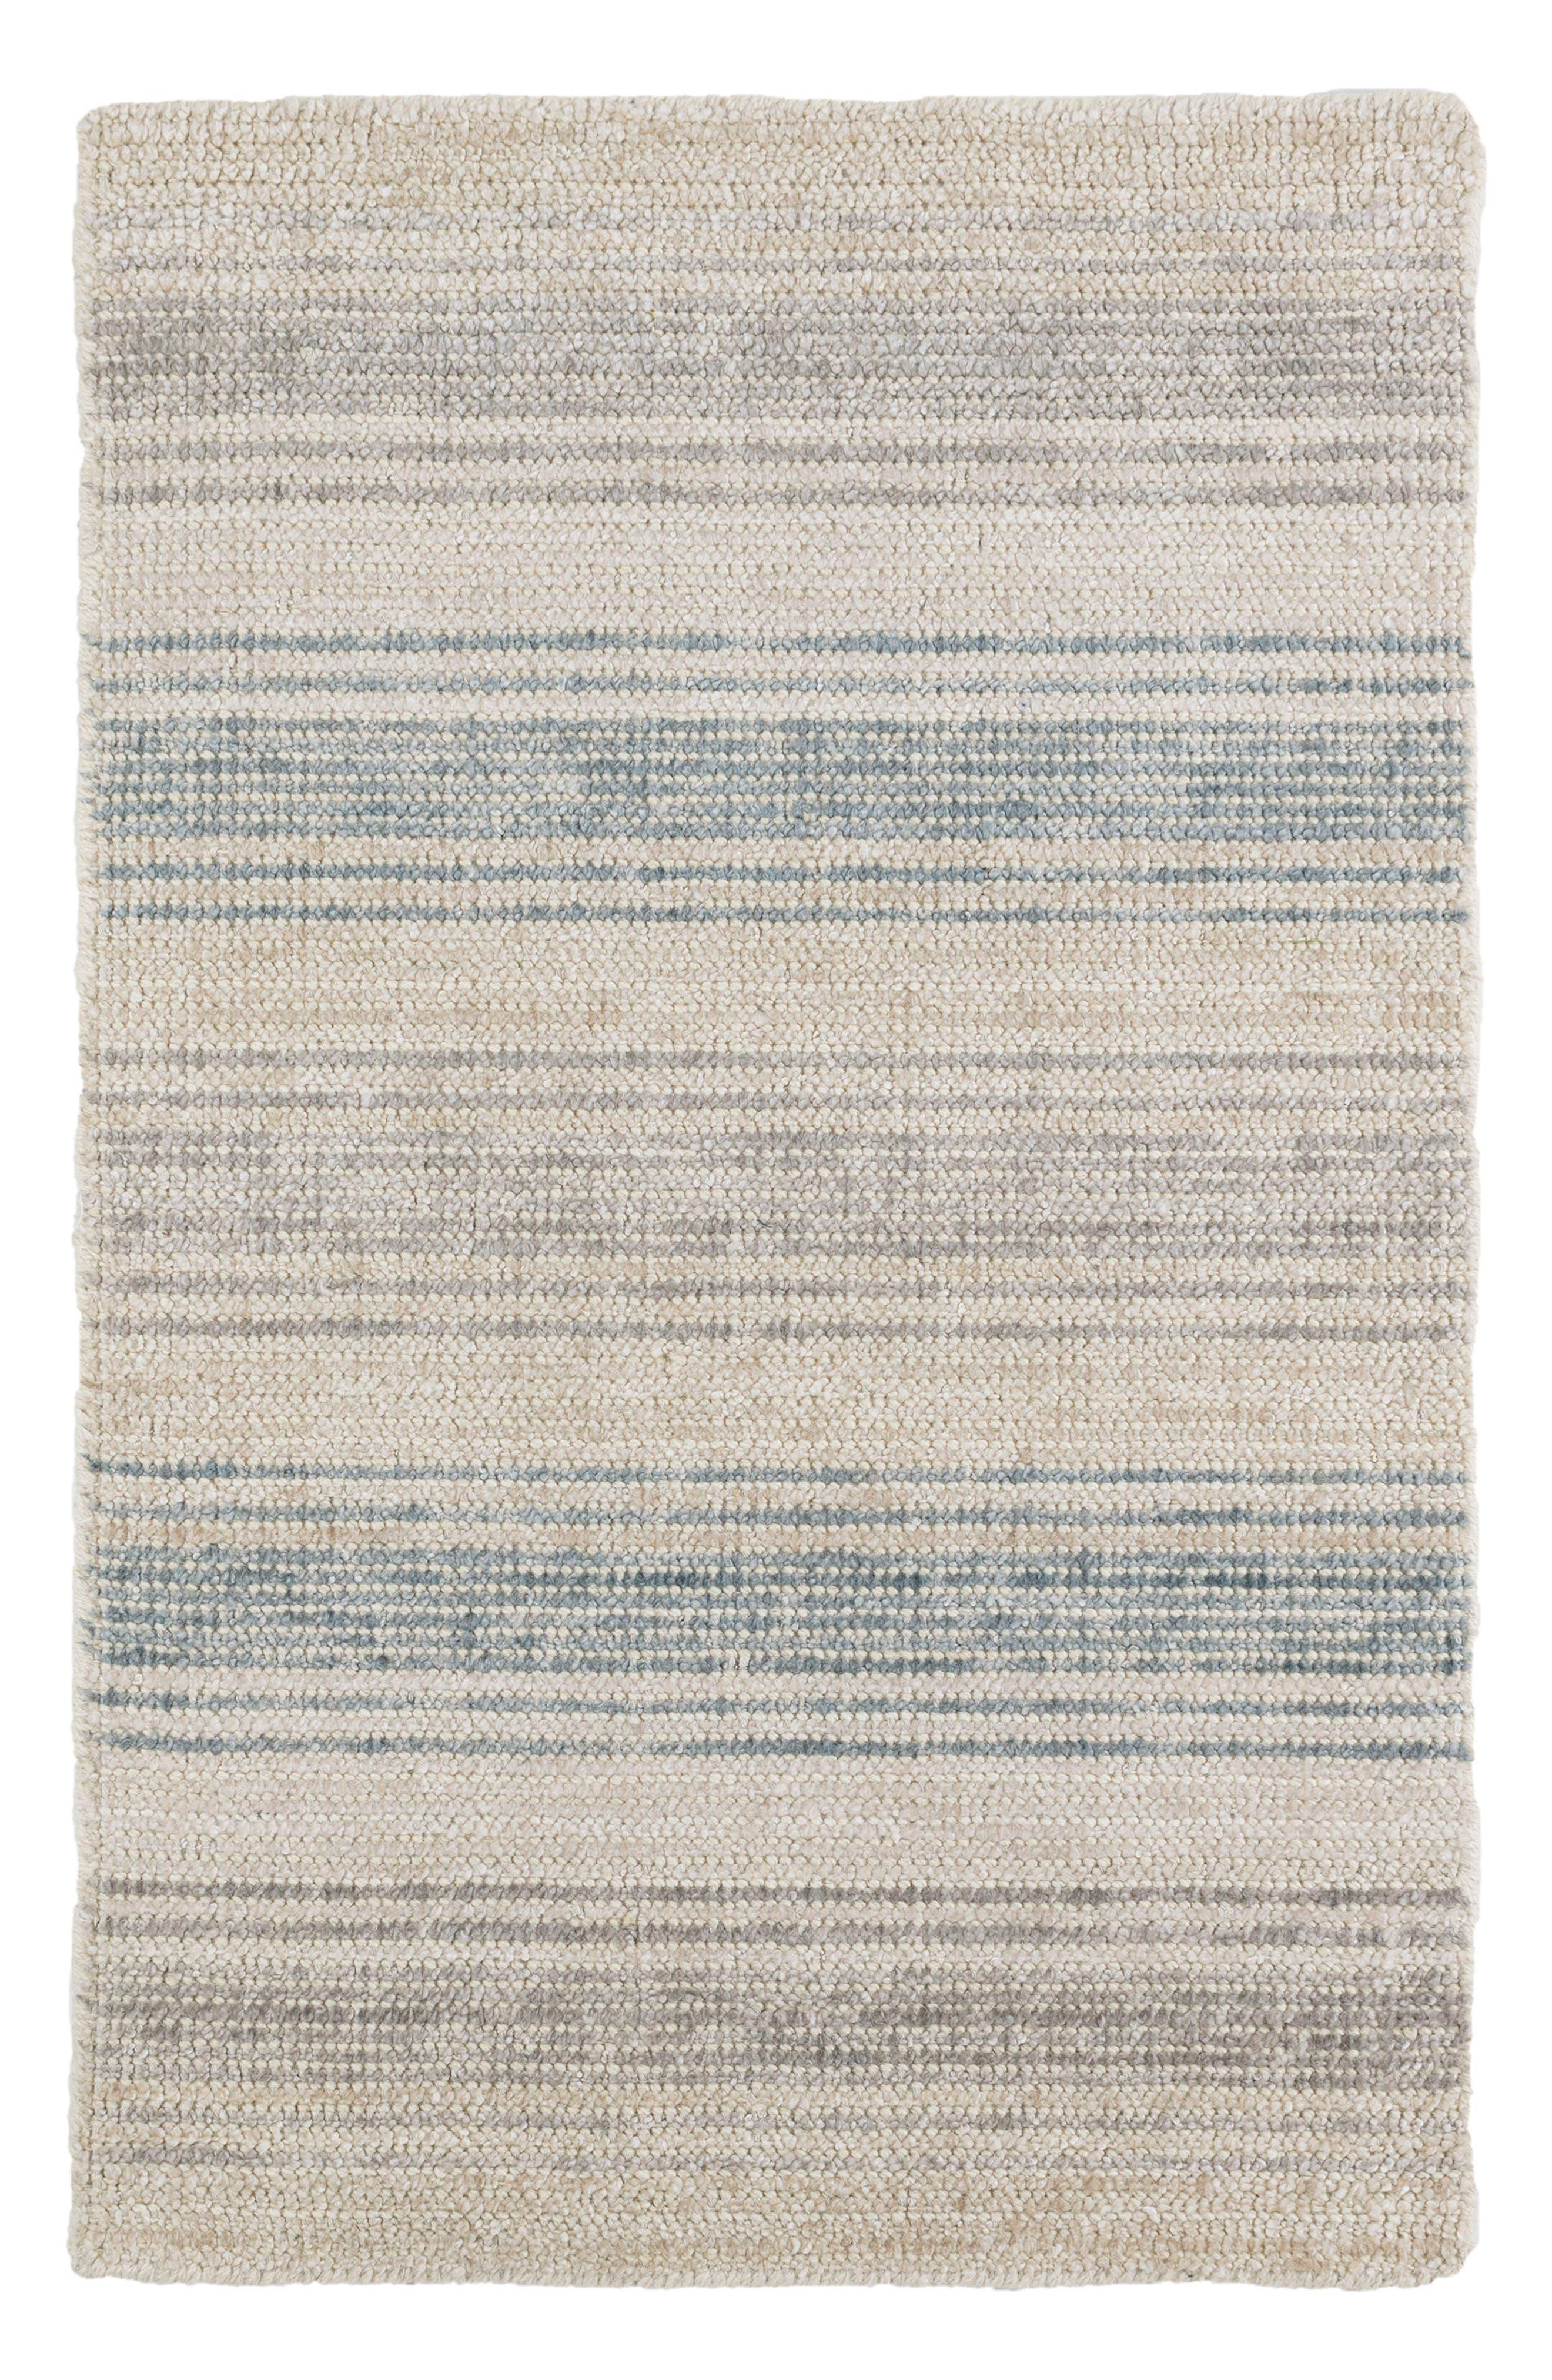 Moonshine Woven Rug,                         Main,                         color, 250